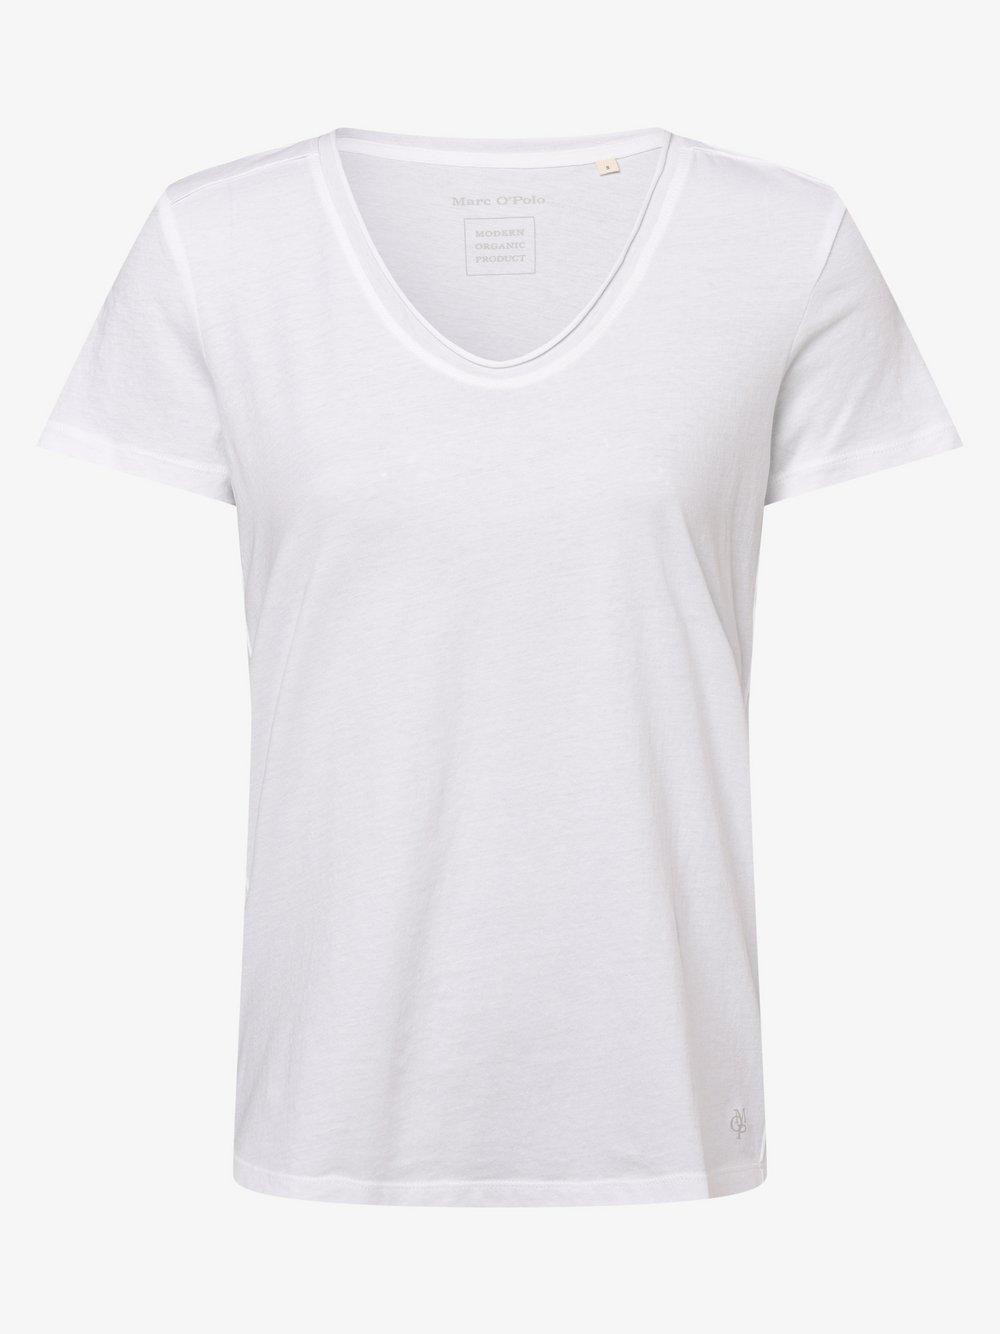 Marc O'Polo - T-shirt damski, biały